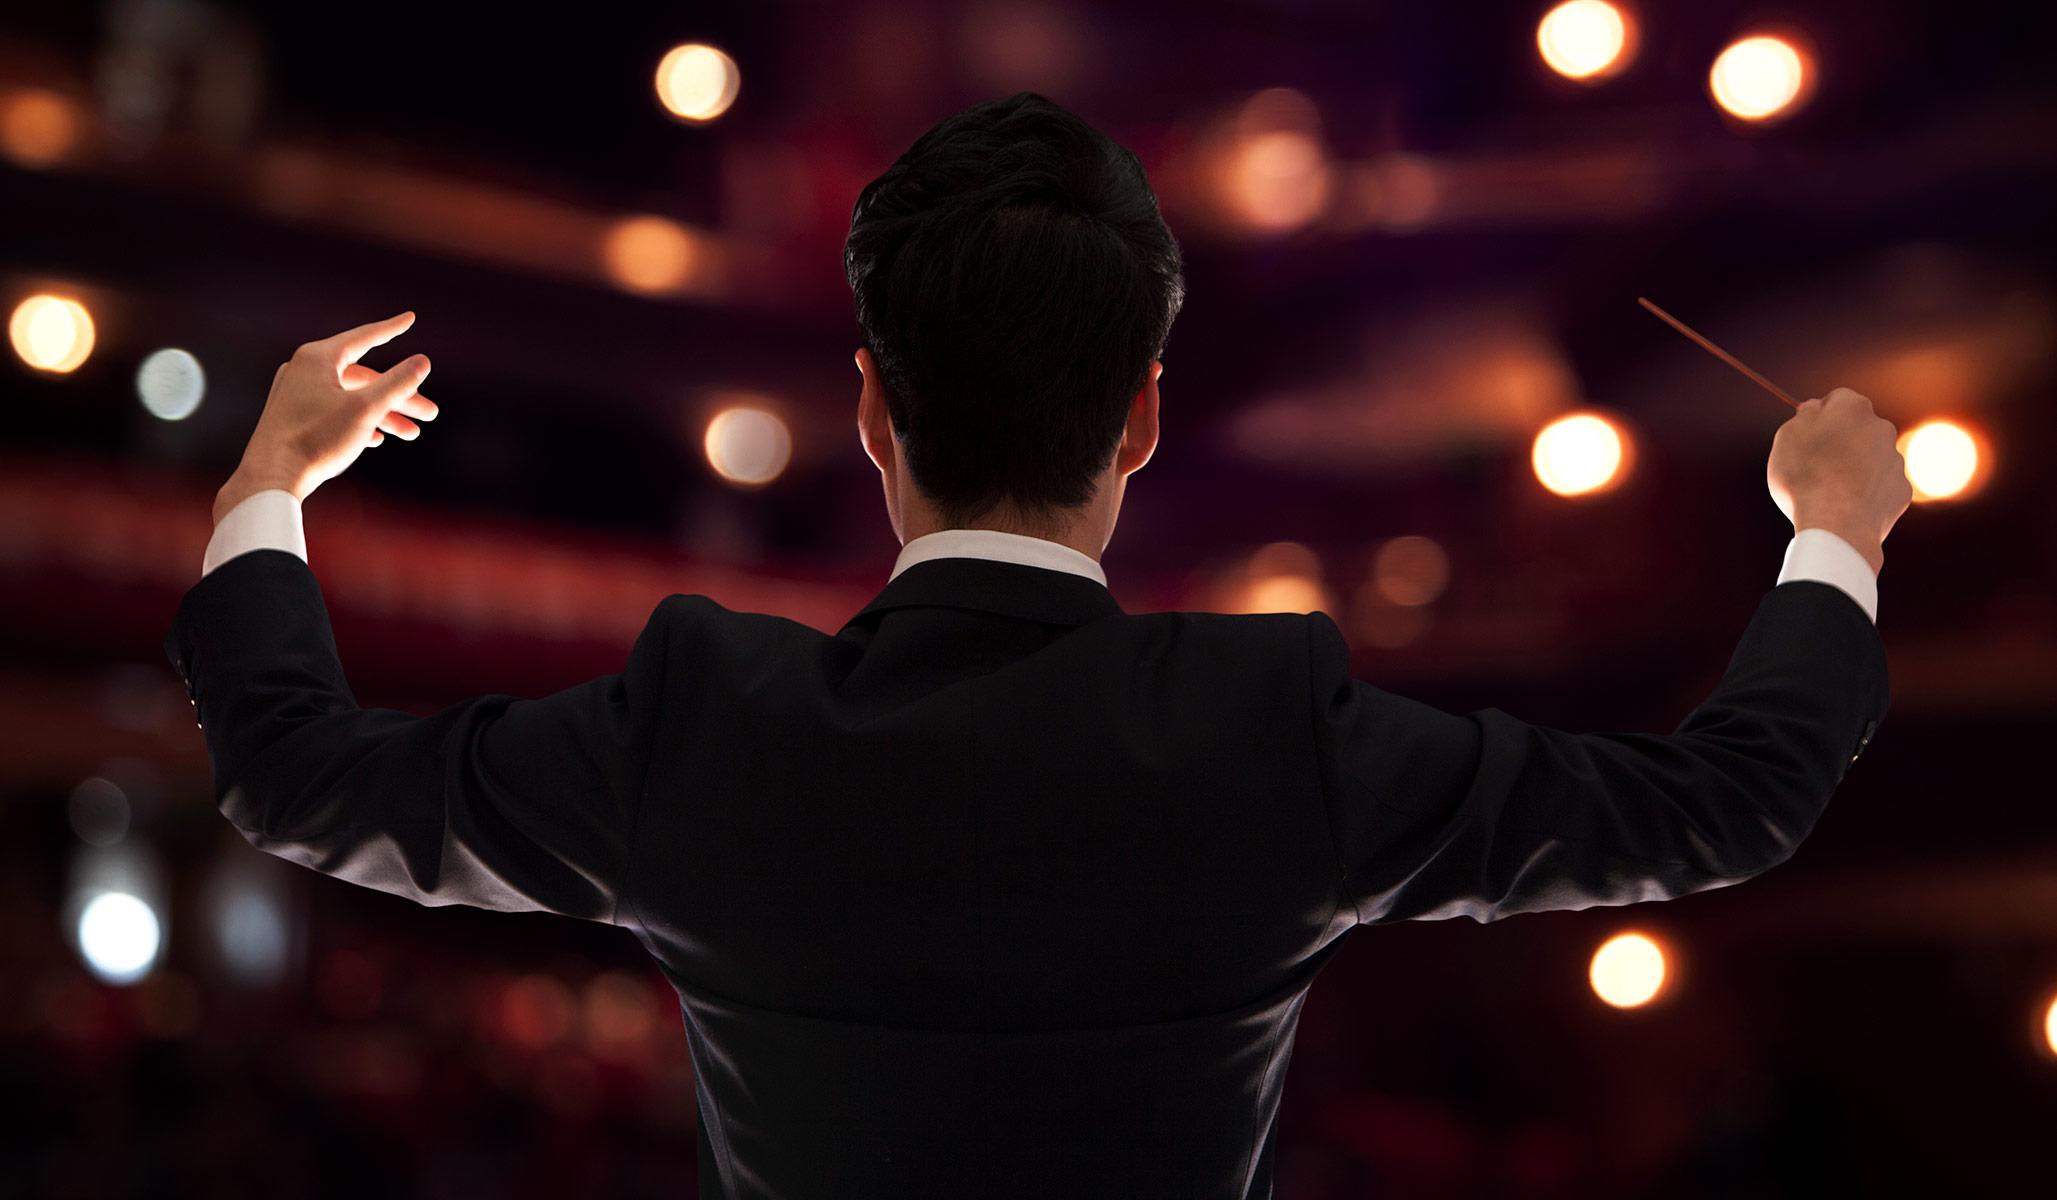 Buffalo Philharmonic: No White or Asian Conductors Need Apply